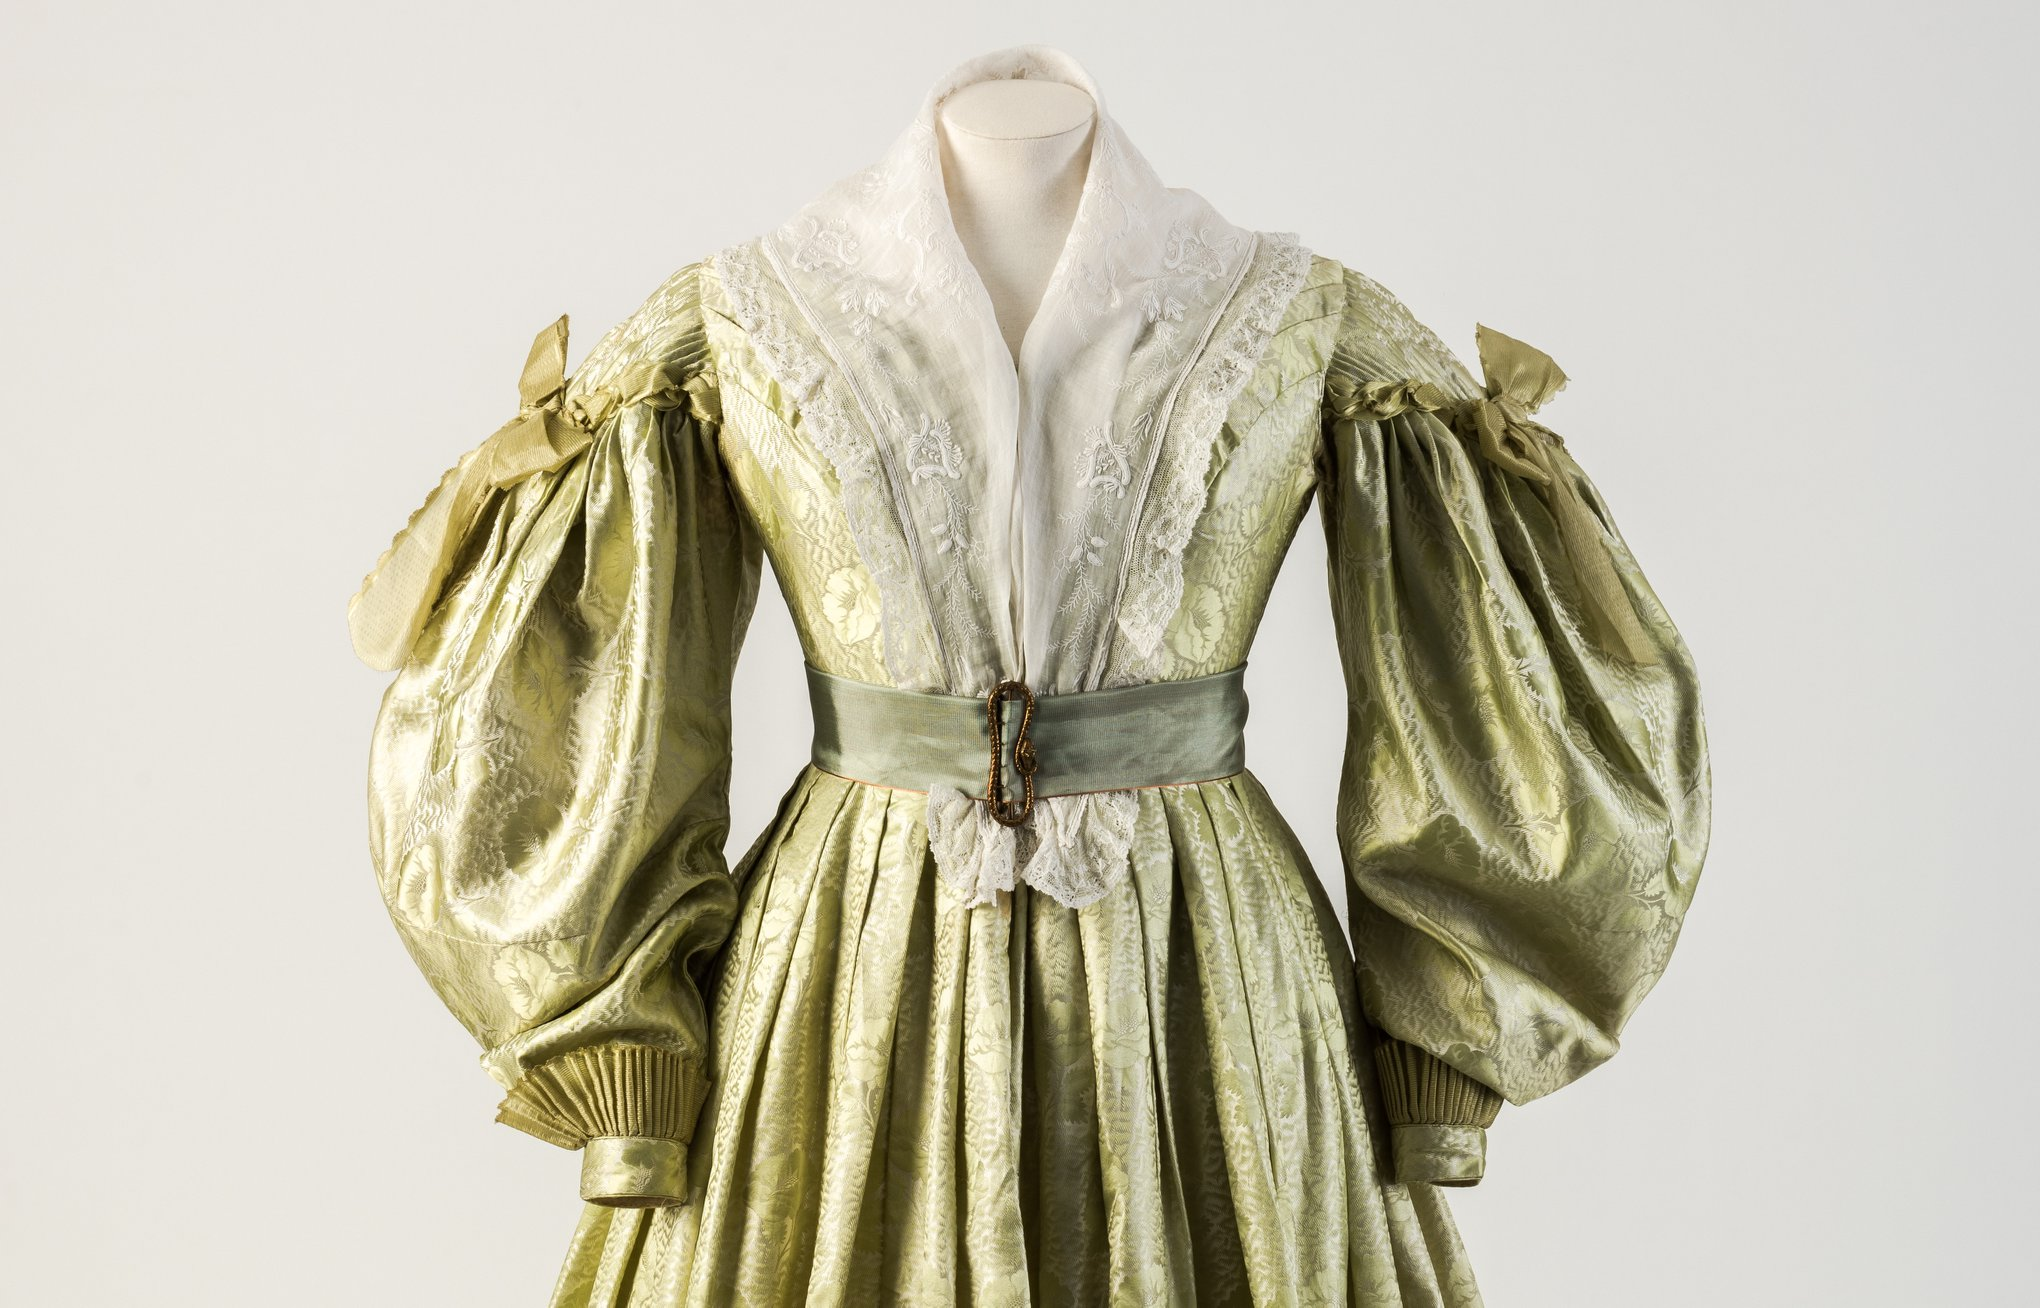 Dress with gigot sleeves, jacquard woven silk, ca. 1835 Fashion Museum Bath